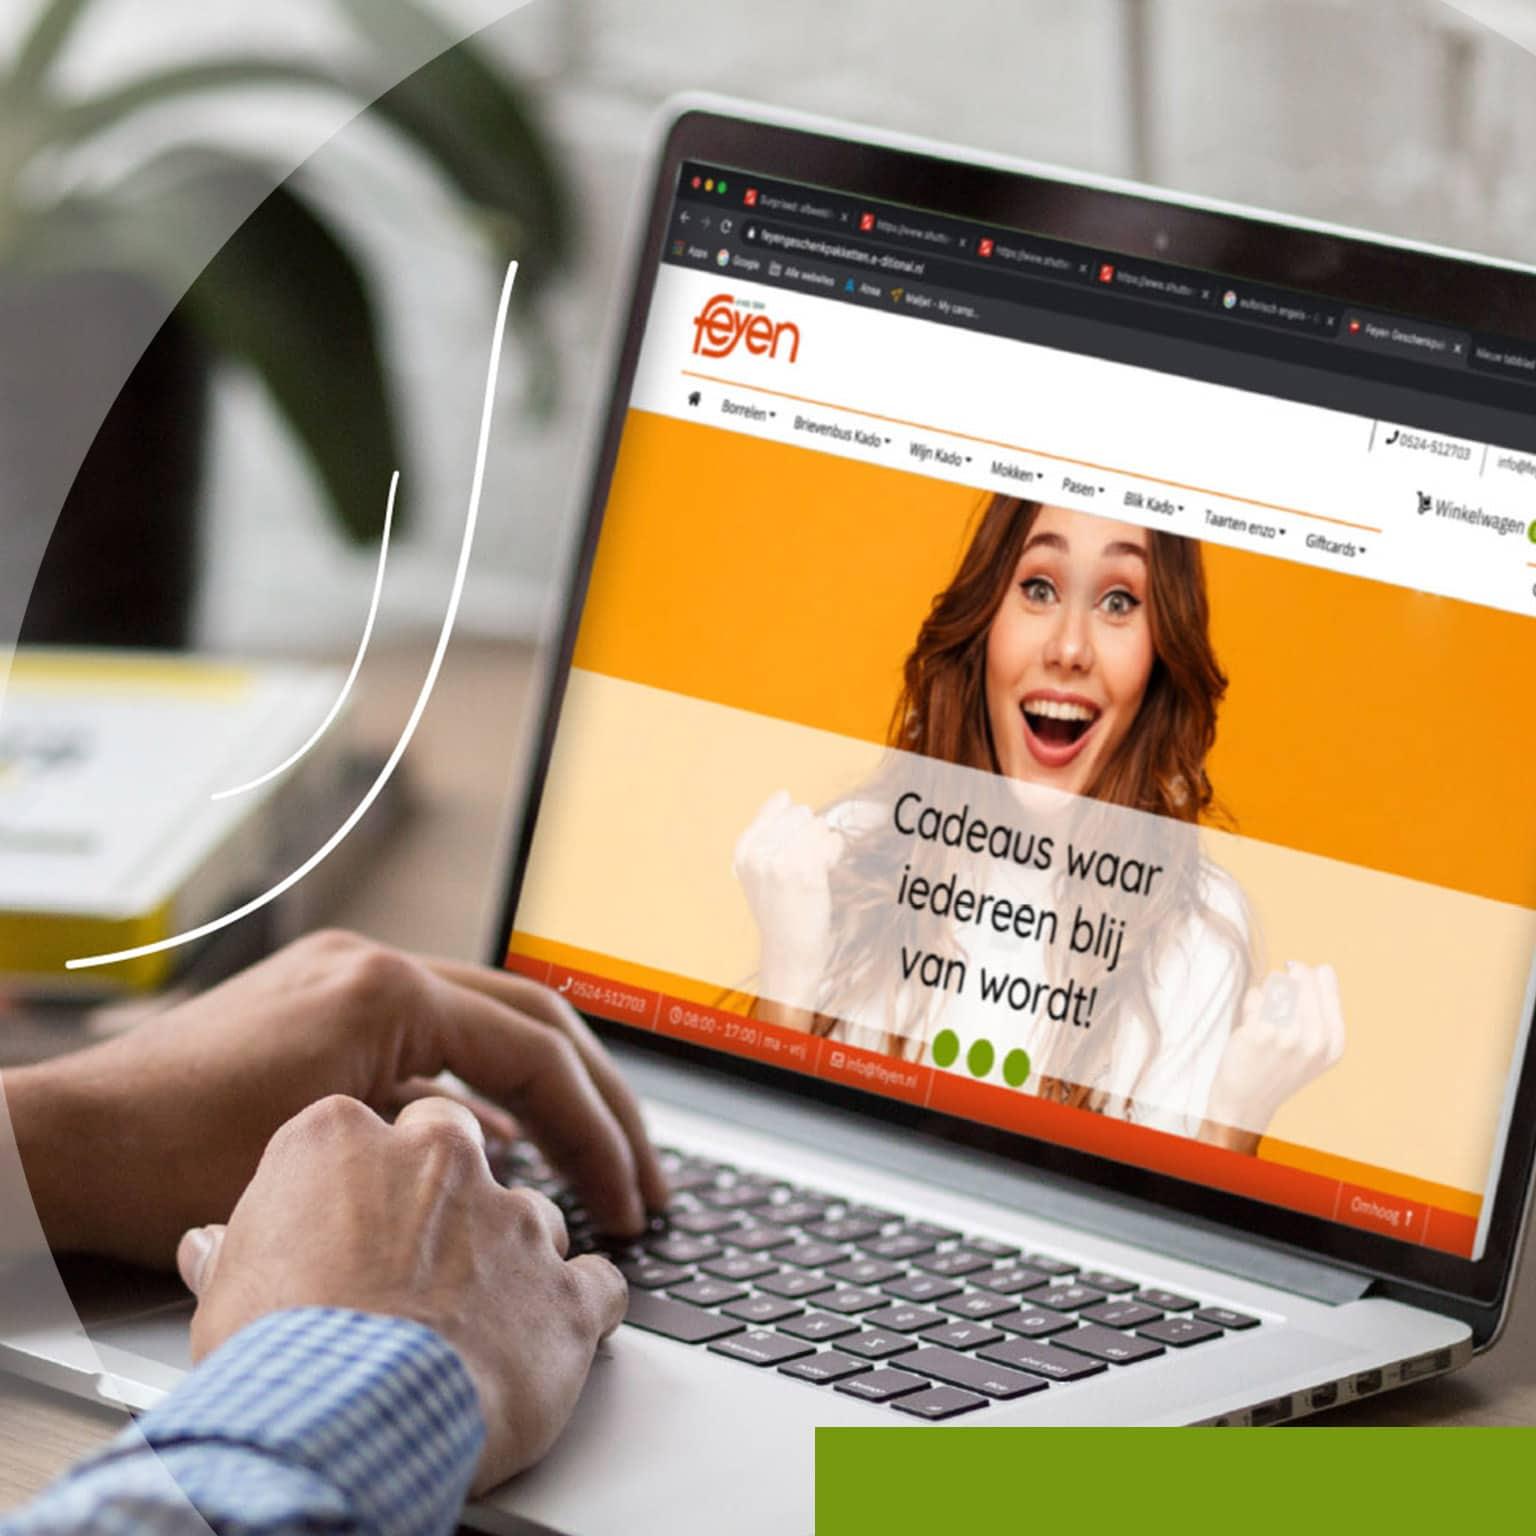 Geschenken.feyen.nl website